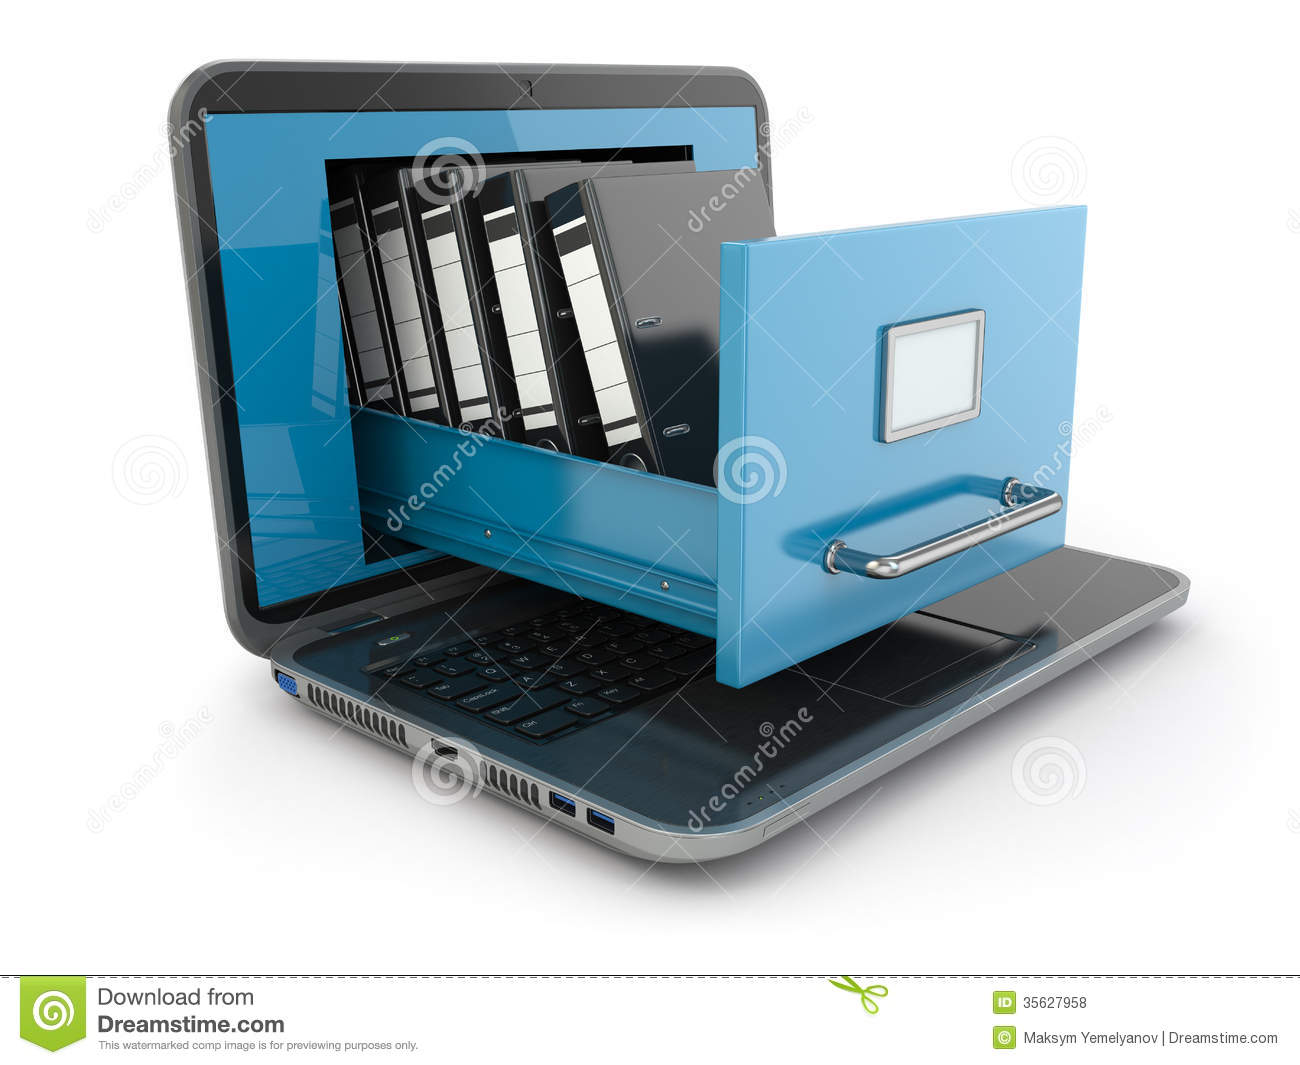 Computer laptop storage clipart.